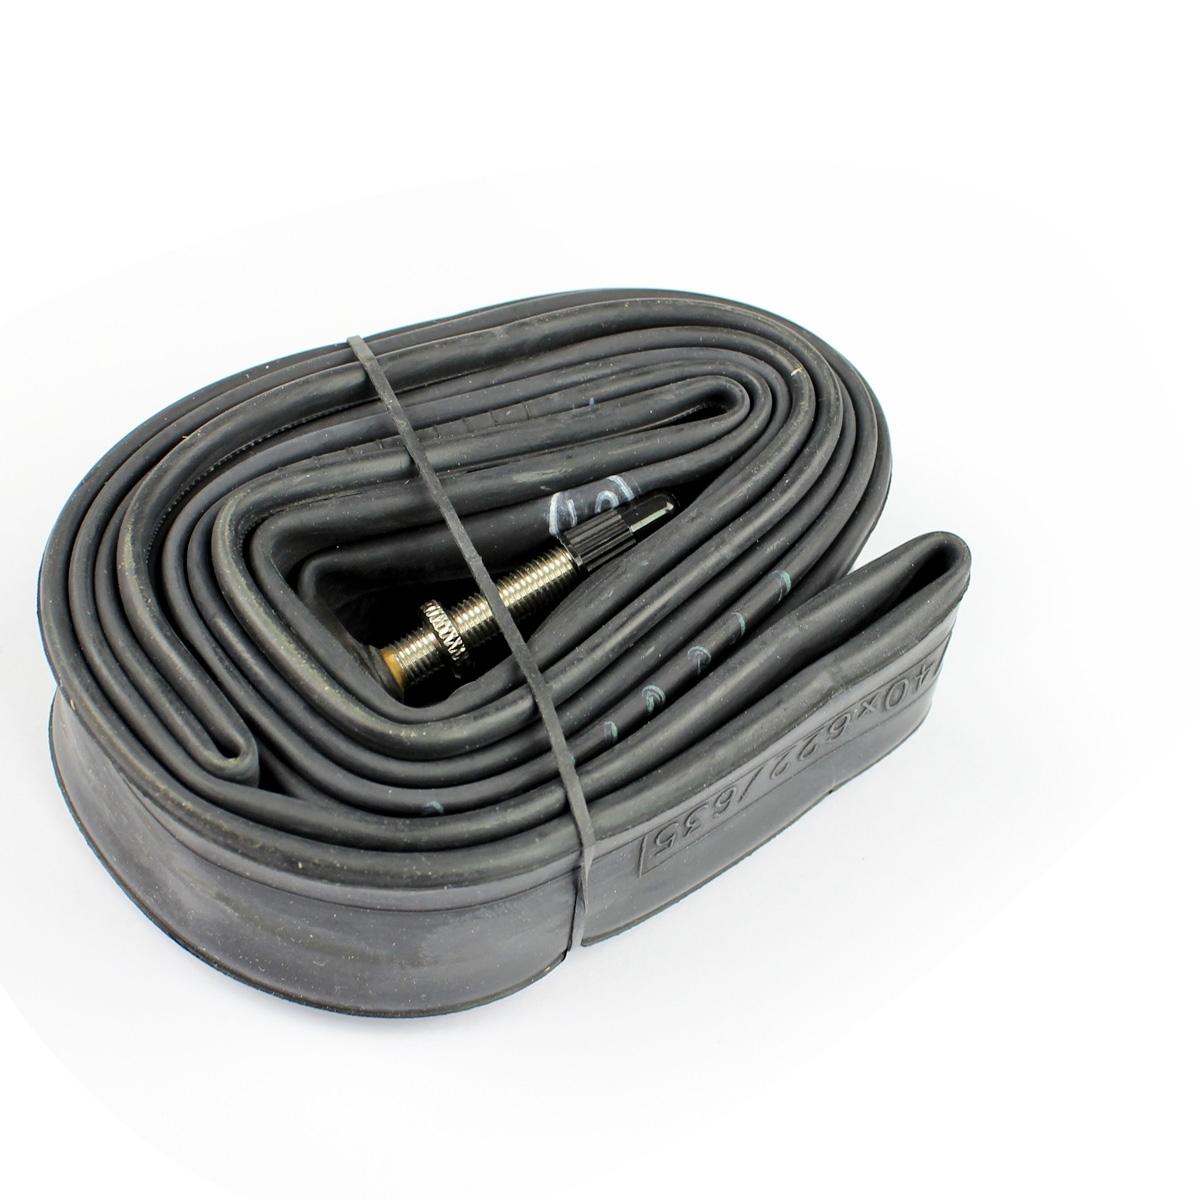 Chambre à air Michelin 700x35/40 A3 Airstop Valve 40 mm Presta (Vrac)